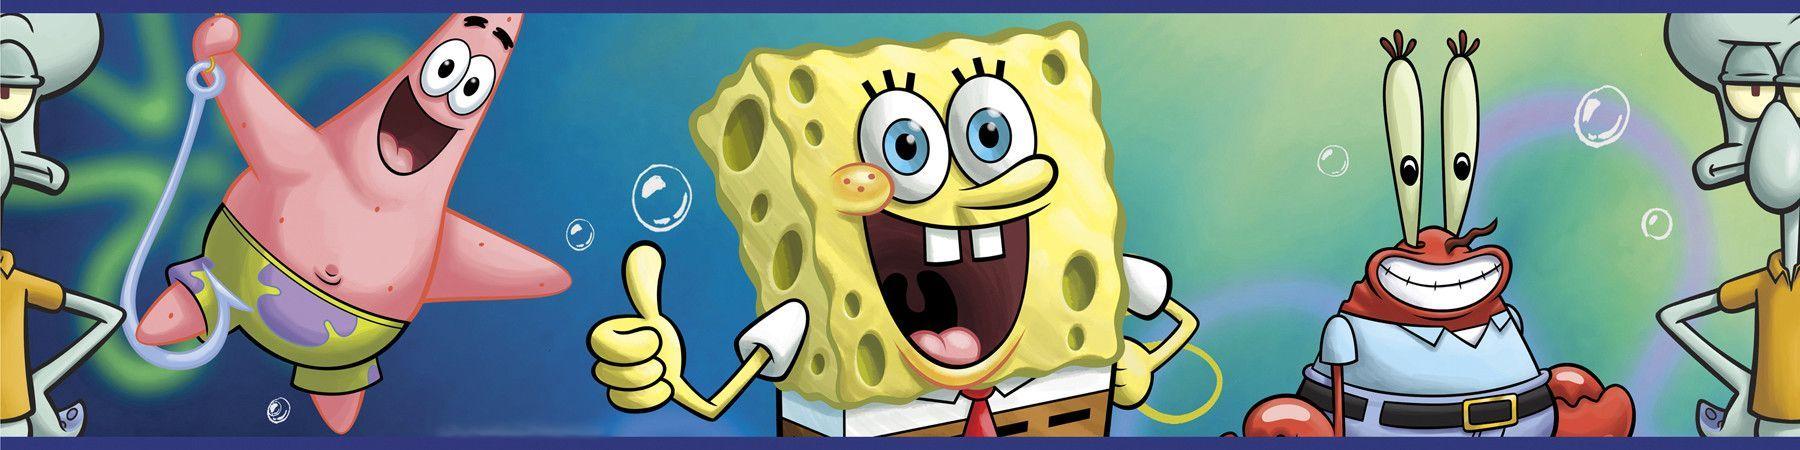 Nickelodeon Spongebob Squarepants 15 X 5 Border Wallpaper Commercial Single Outlet Receptacle Nema 6 20r 20a 250v 5823 Ebay